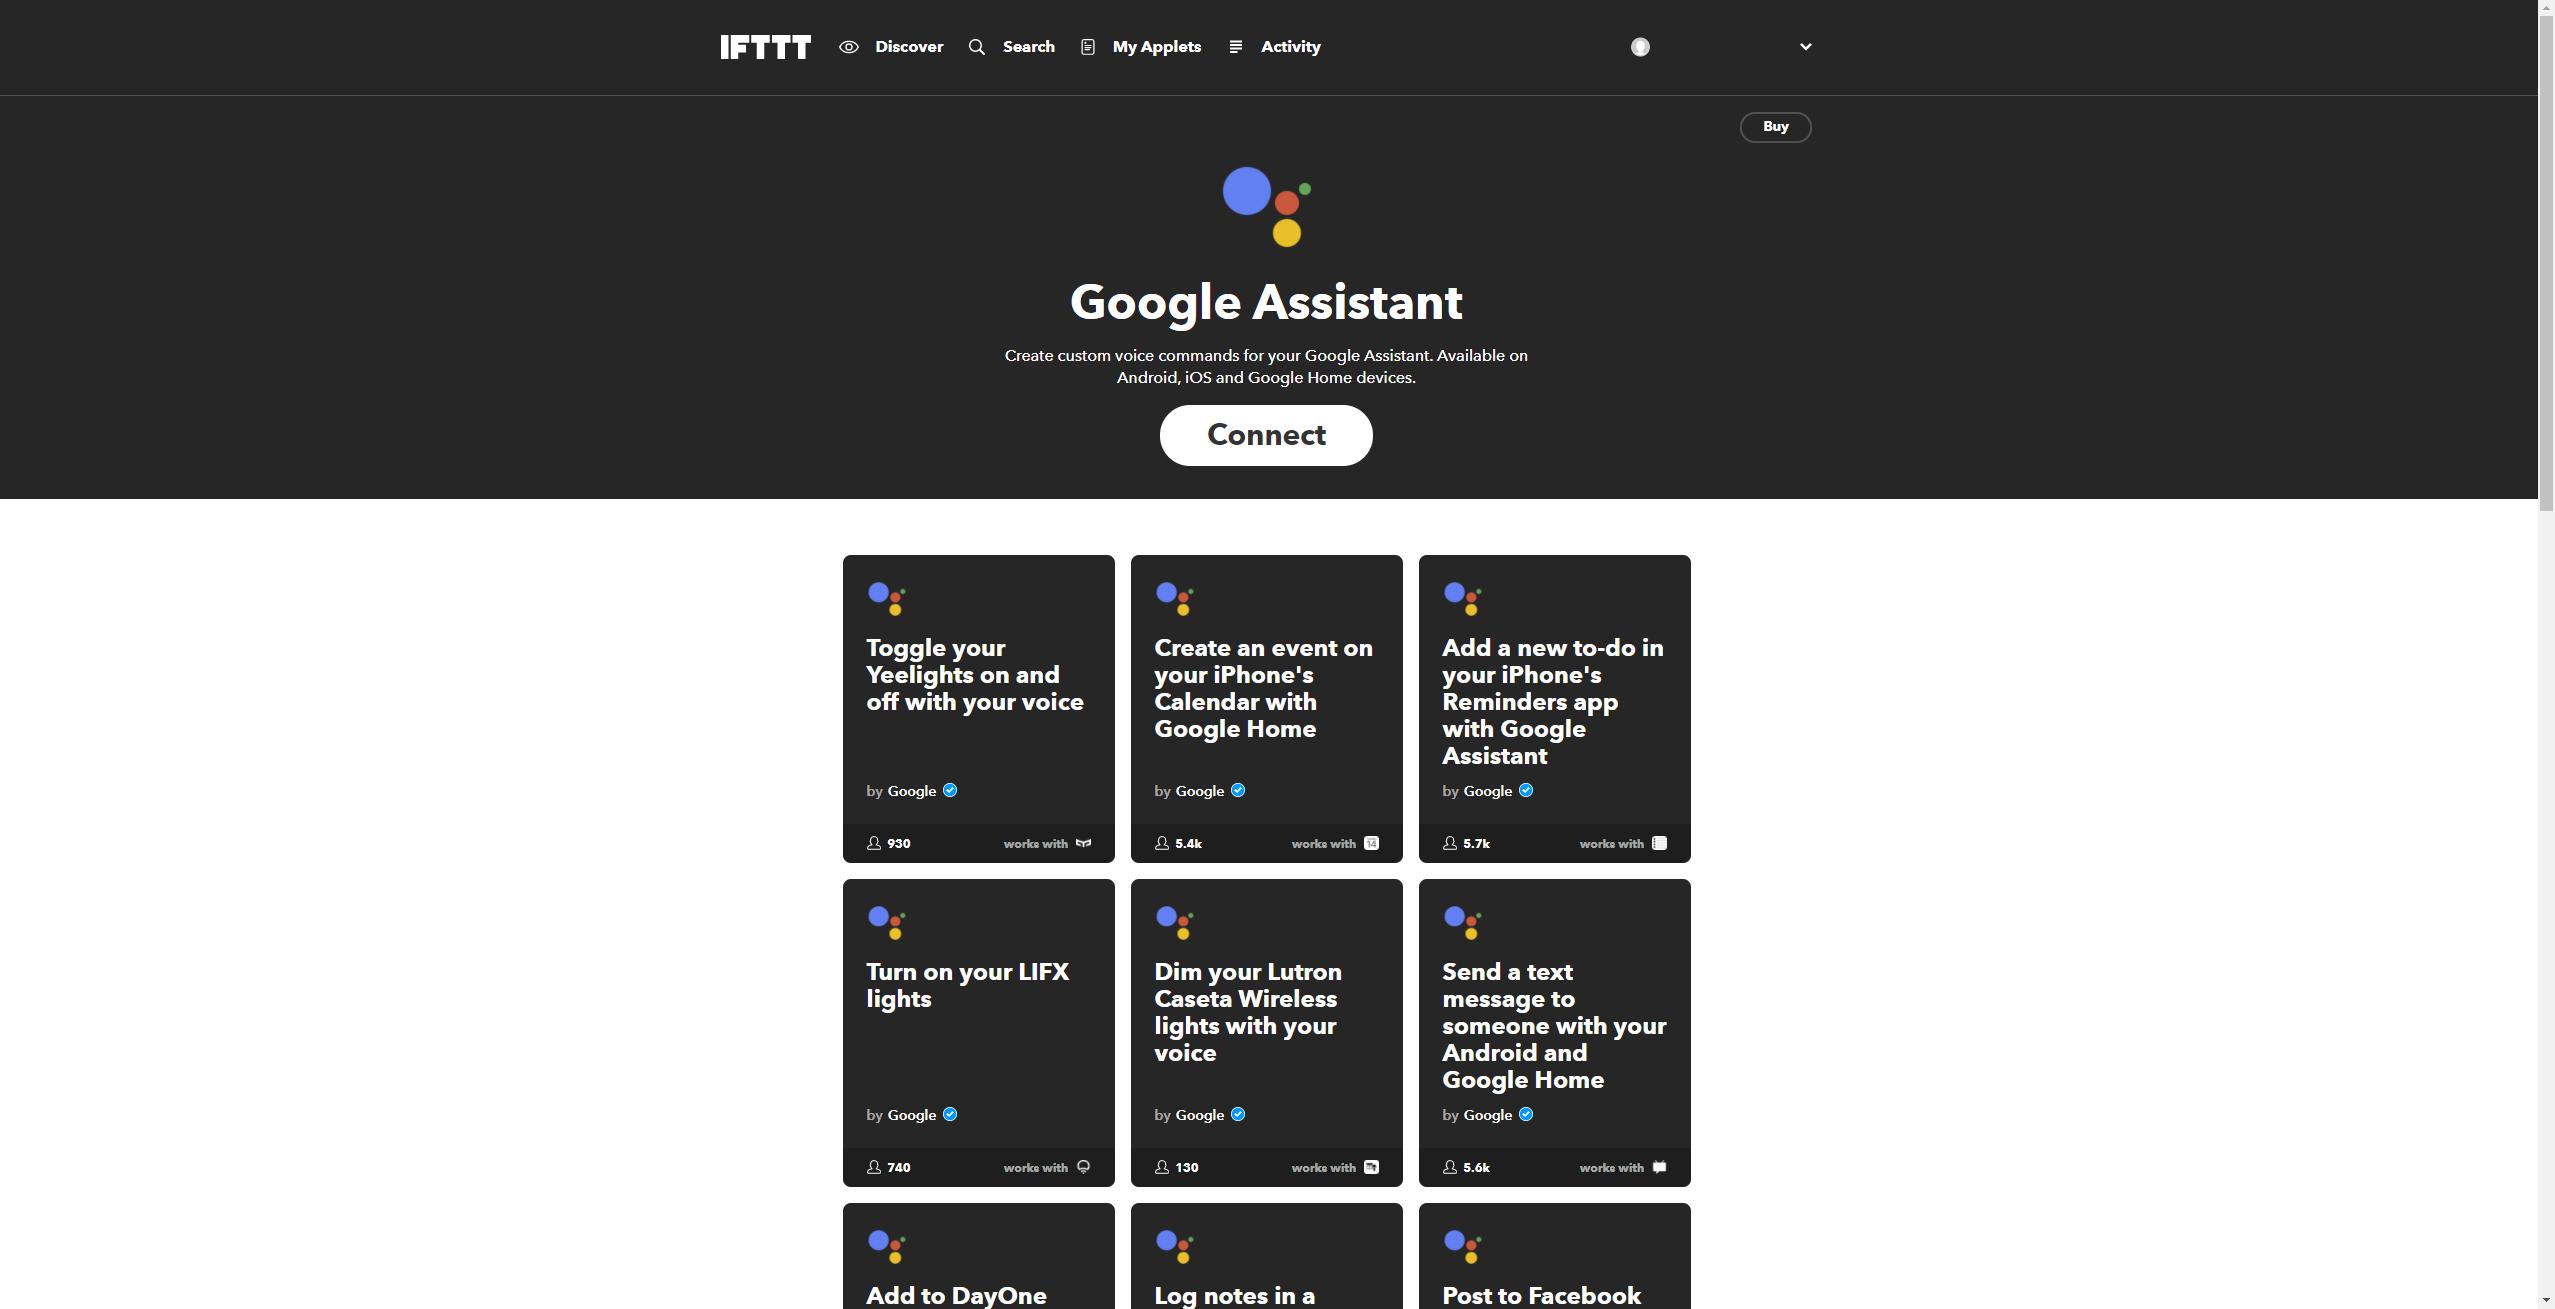 IFTTT-Google-Assistant-hinzufügen-2